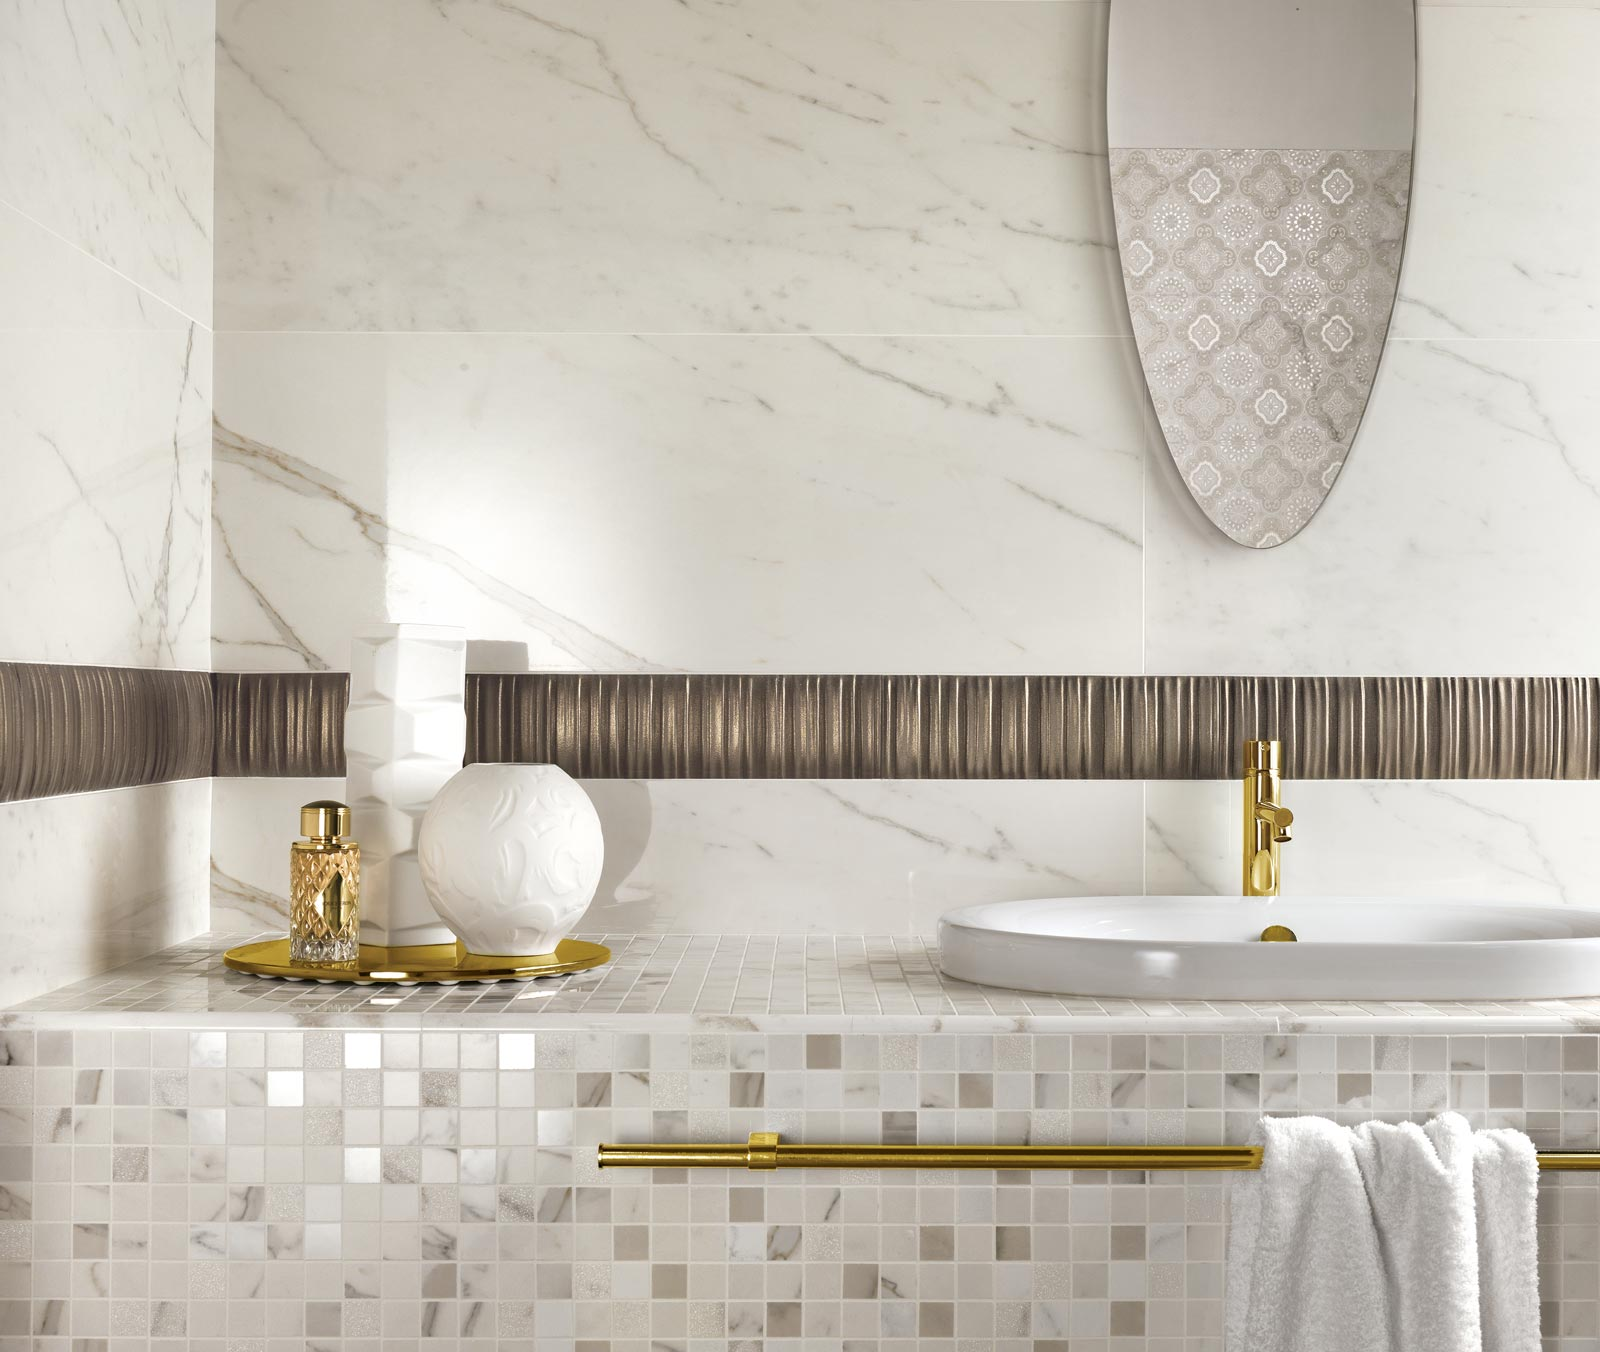 daylight ceramic tiles ragno_5381